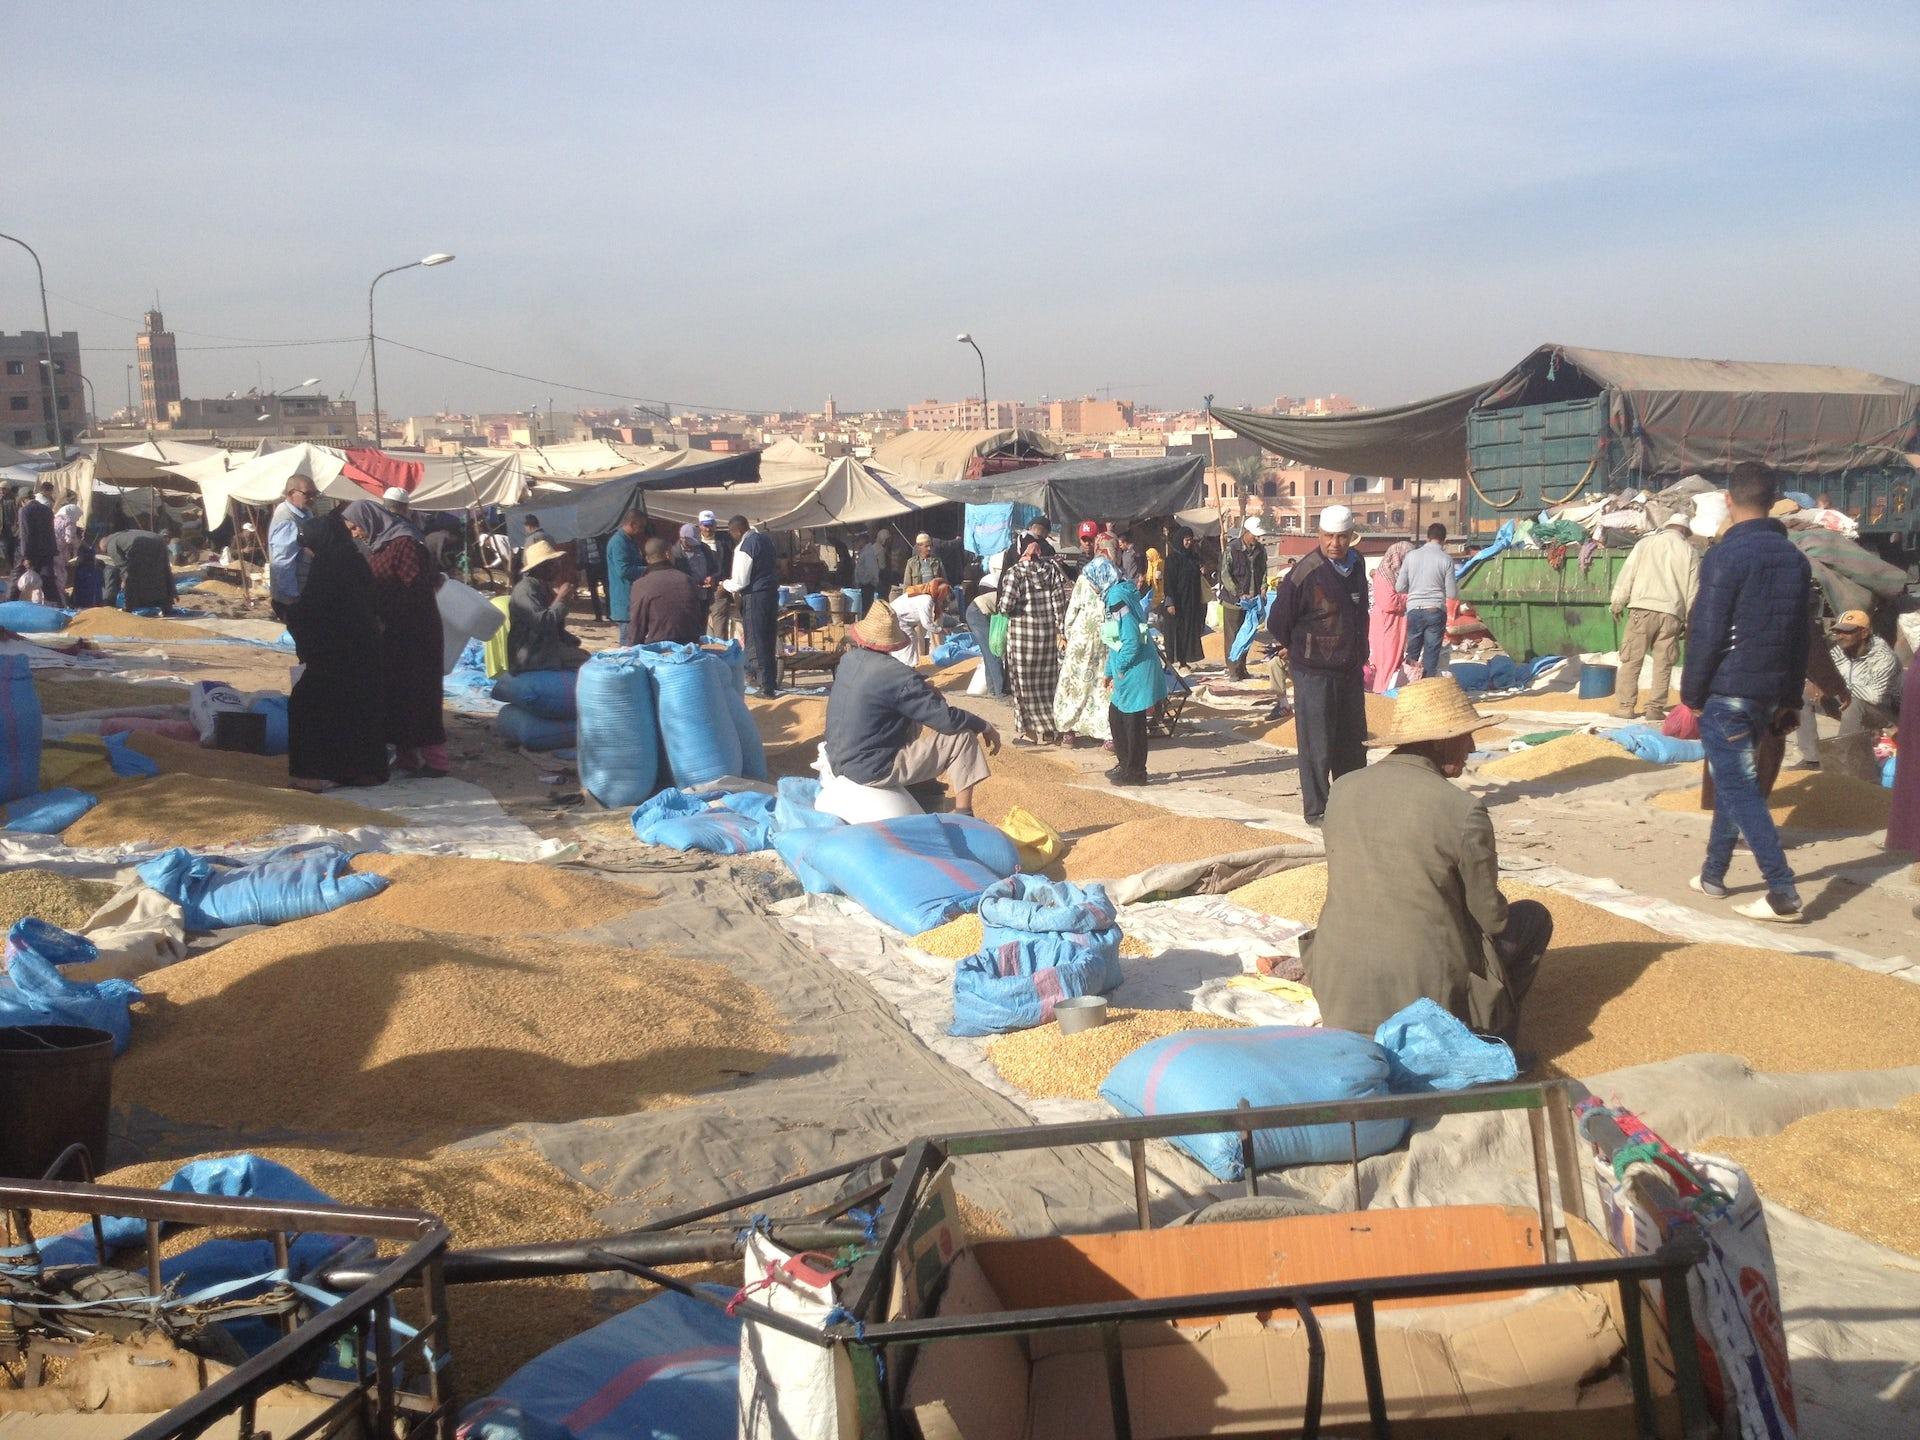 Weekly cereal market in Beni Mellal. (Photo credit: Katharina Graf, author provided)